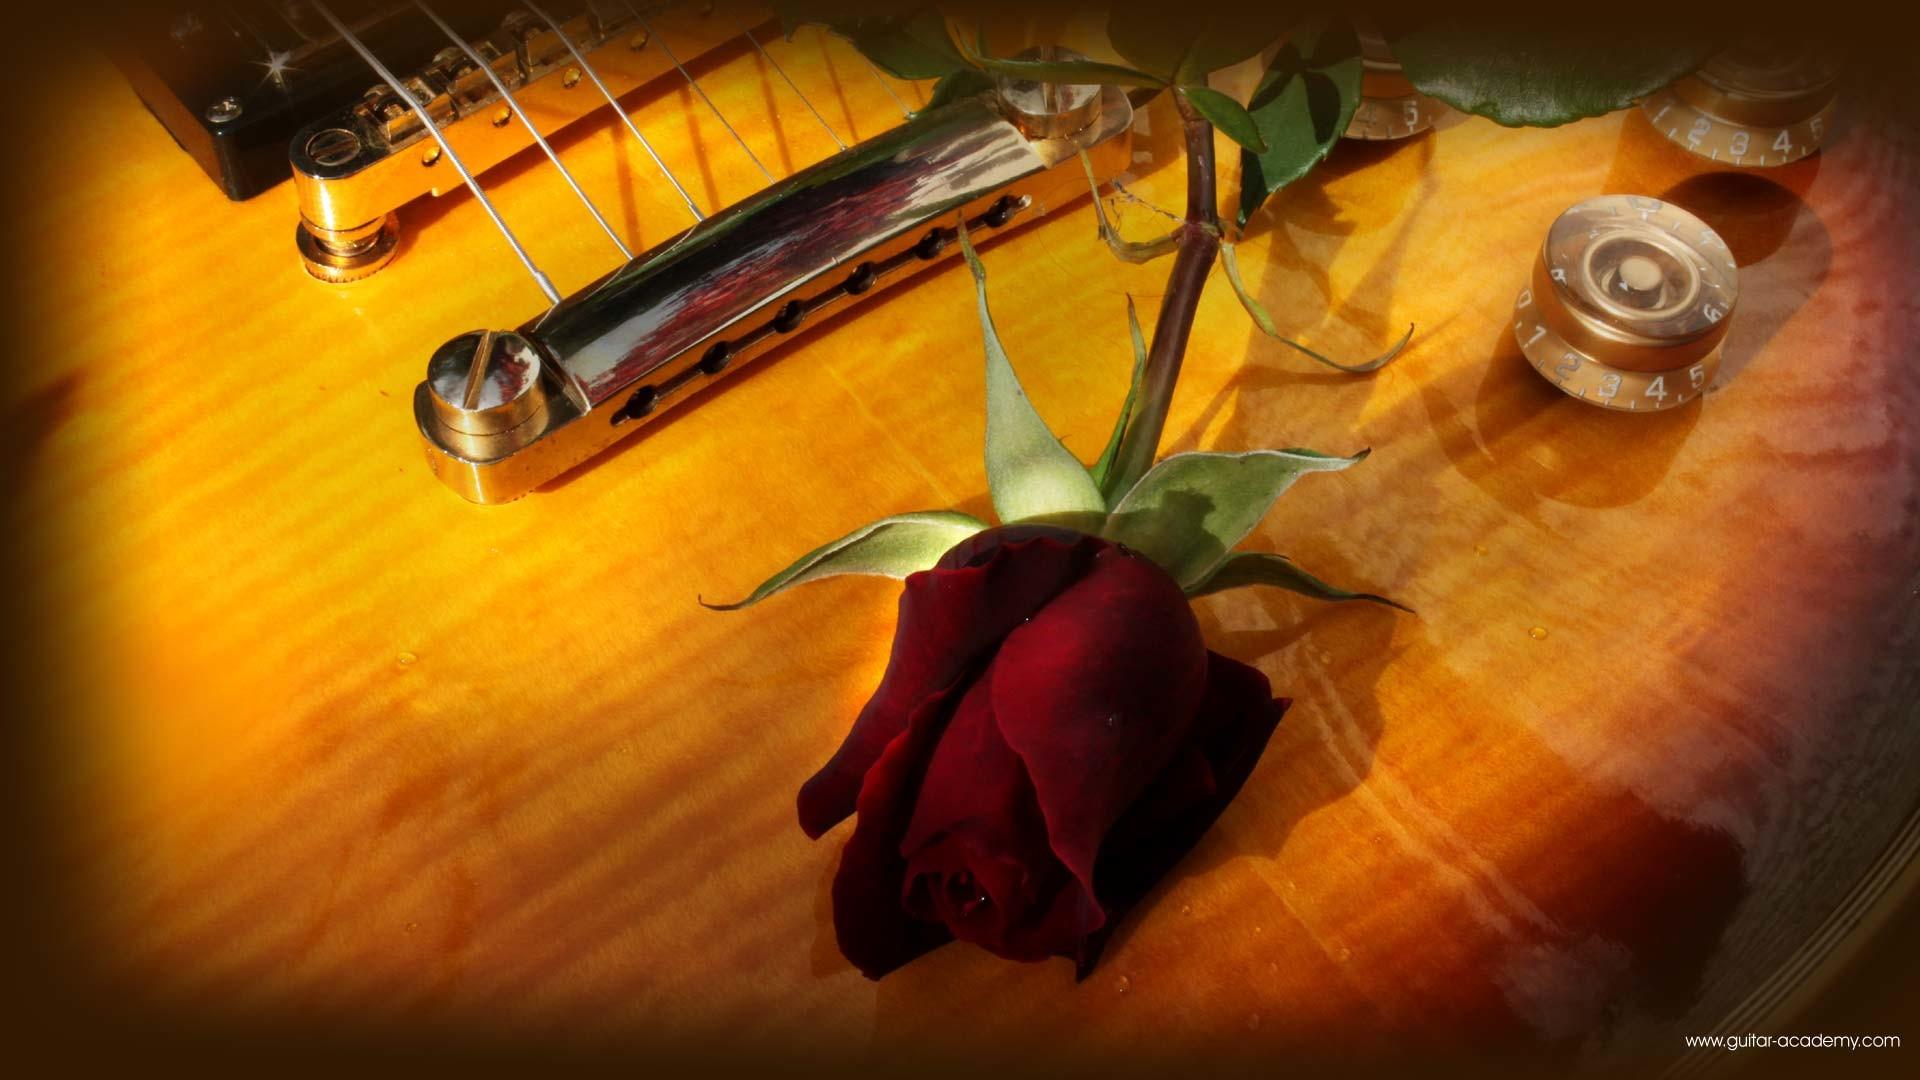 Guitar wallpaper, romantic looking Gibson Les Paul and red rose